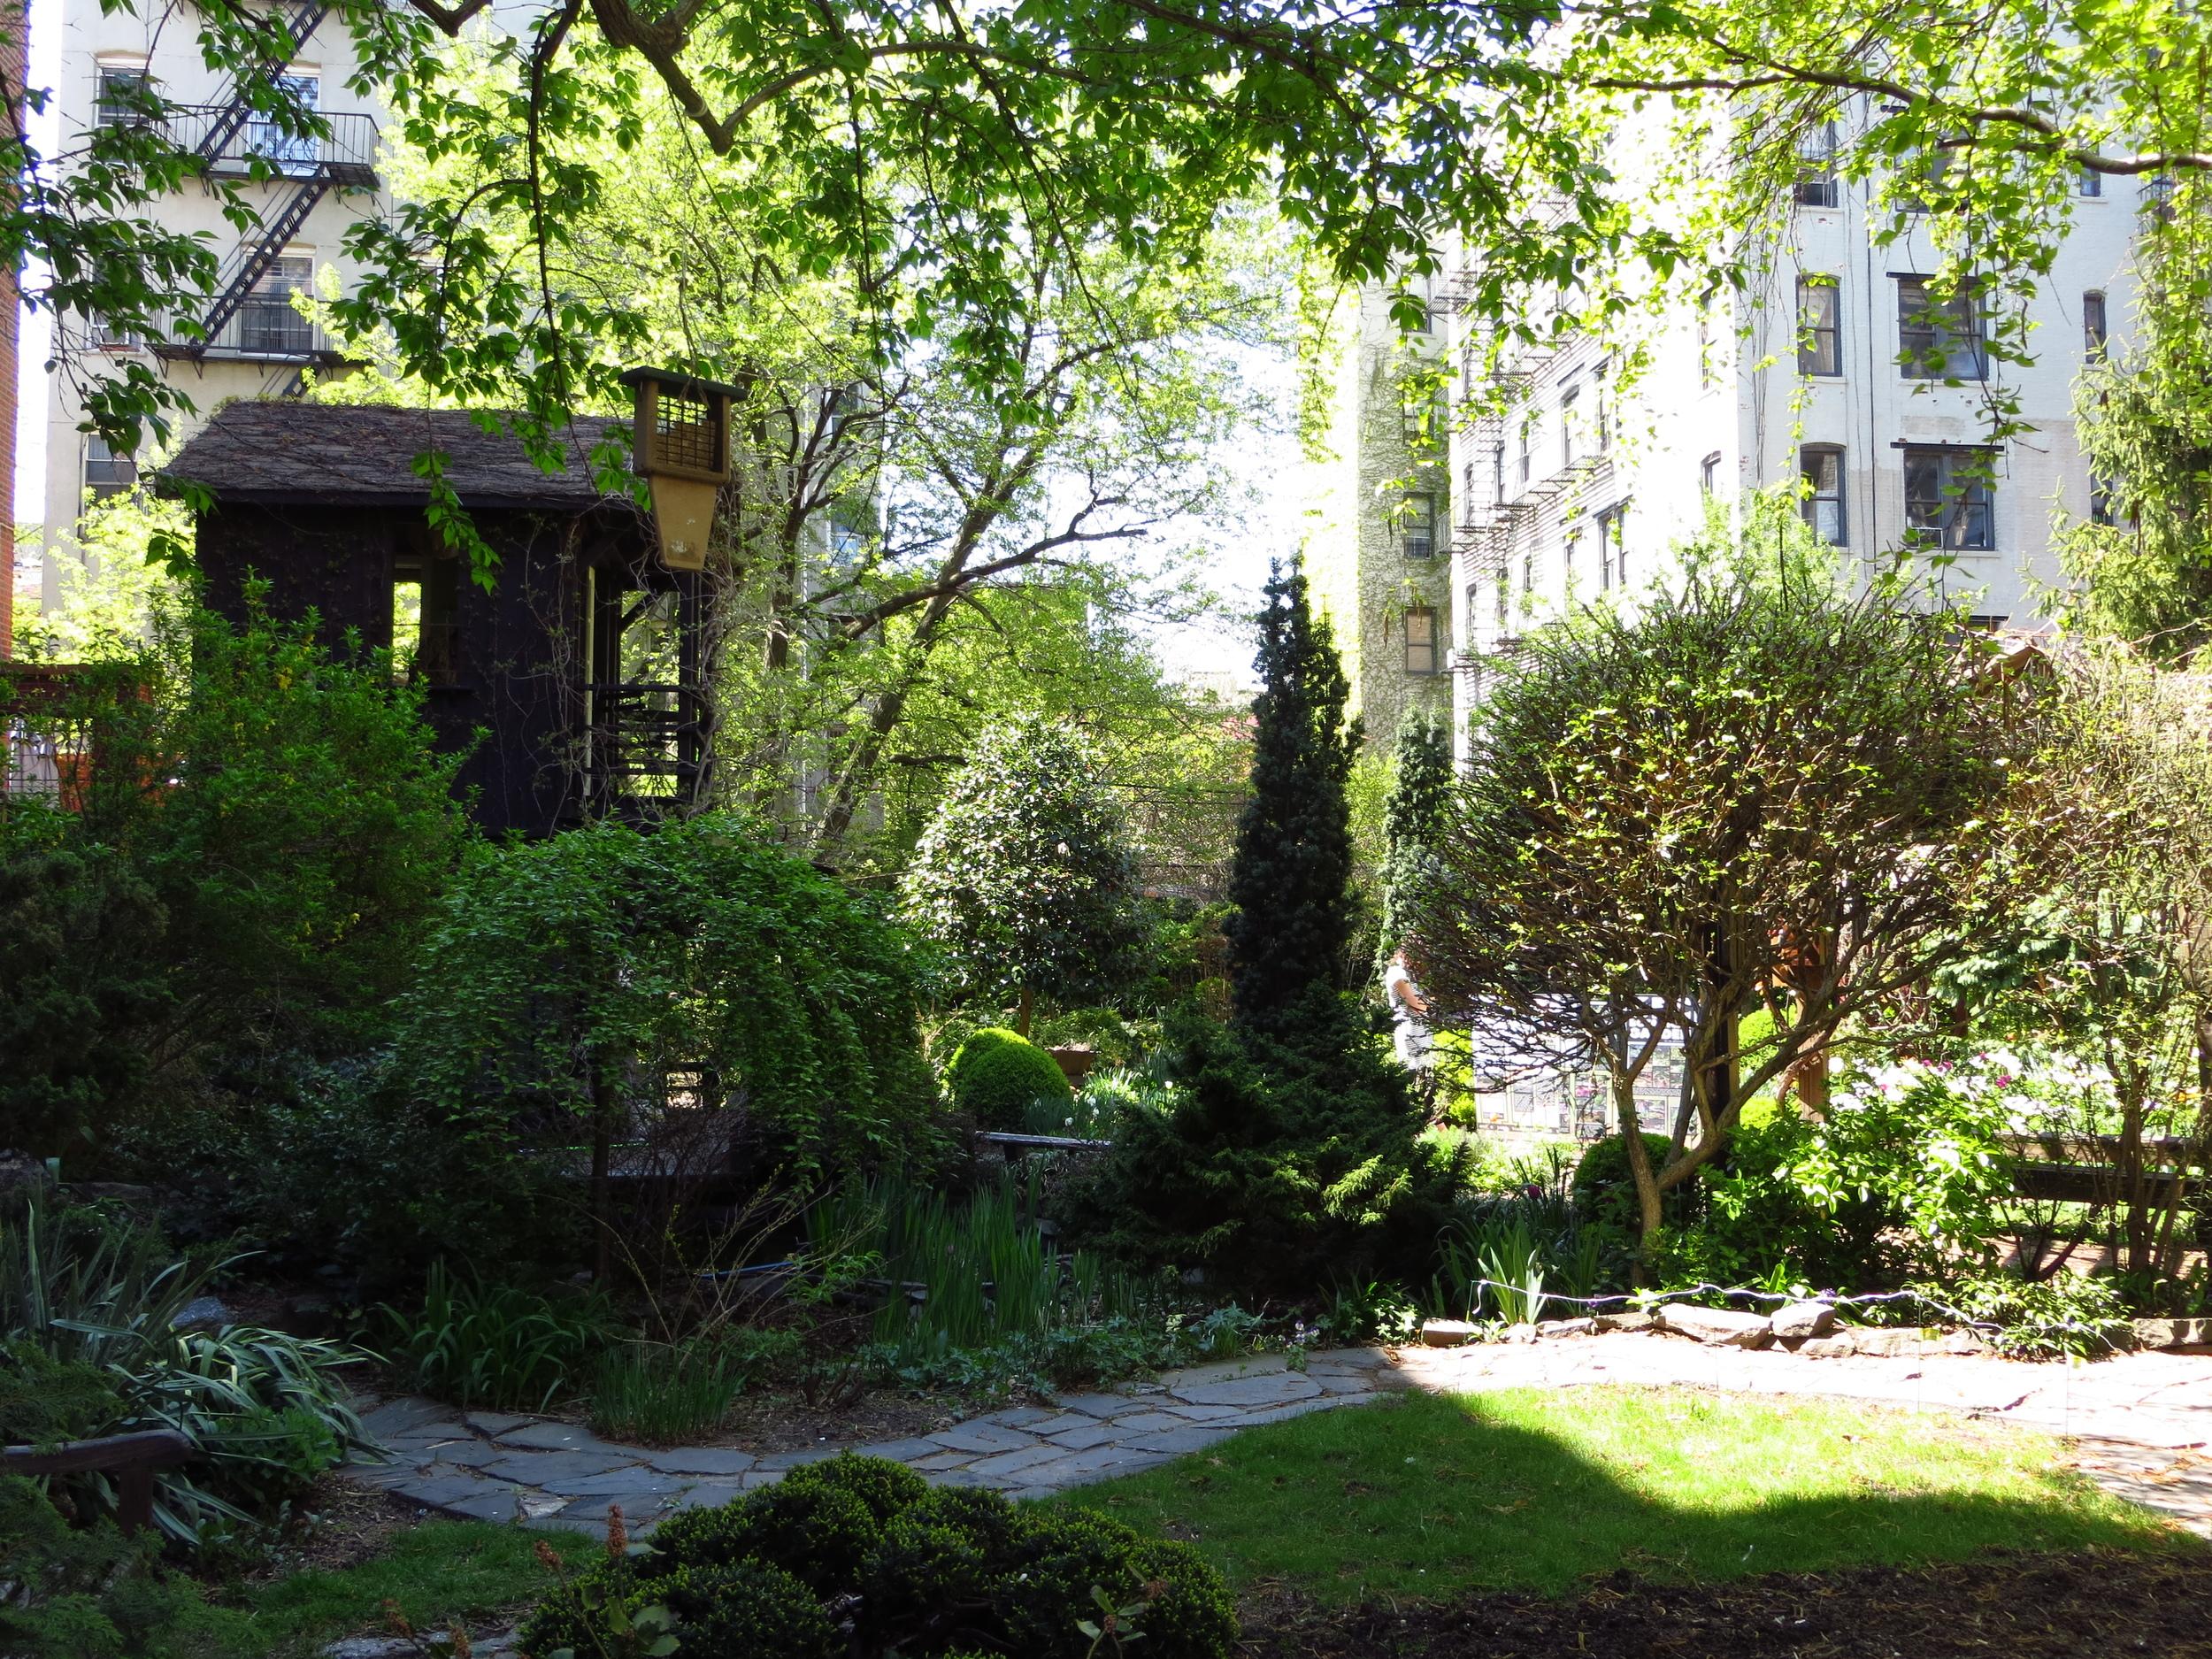 Community garden/treehouse